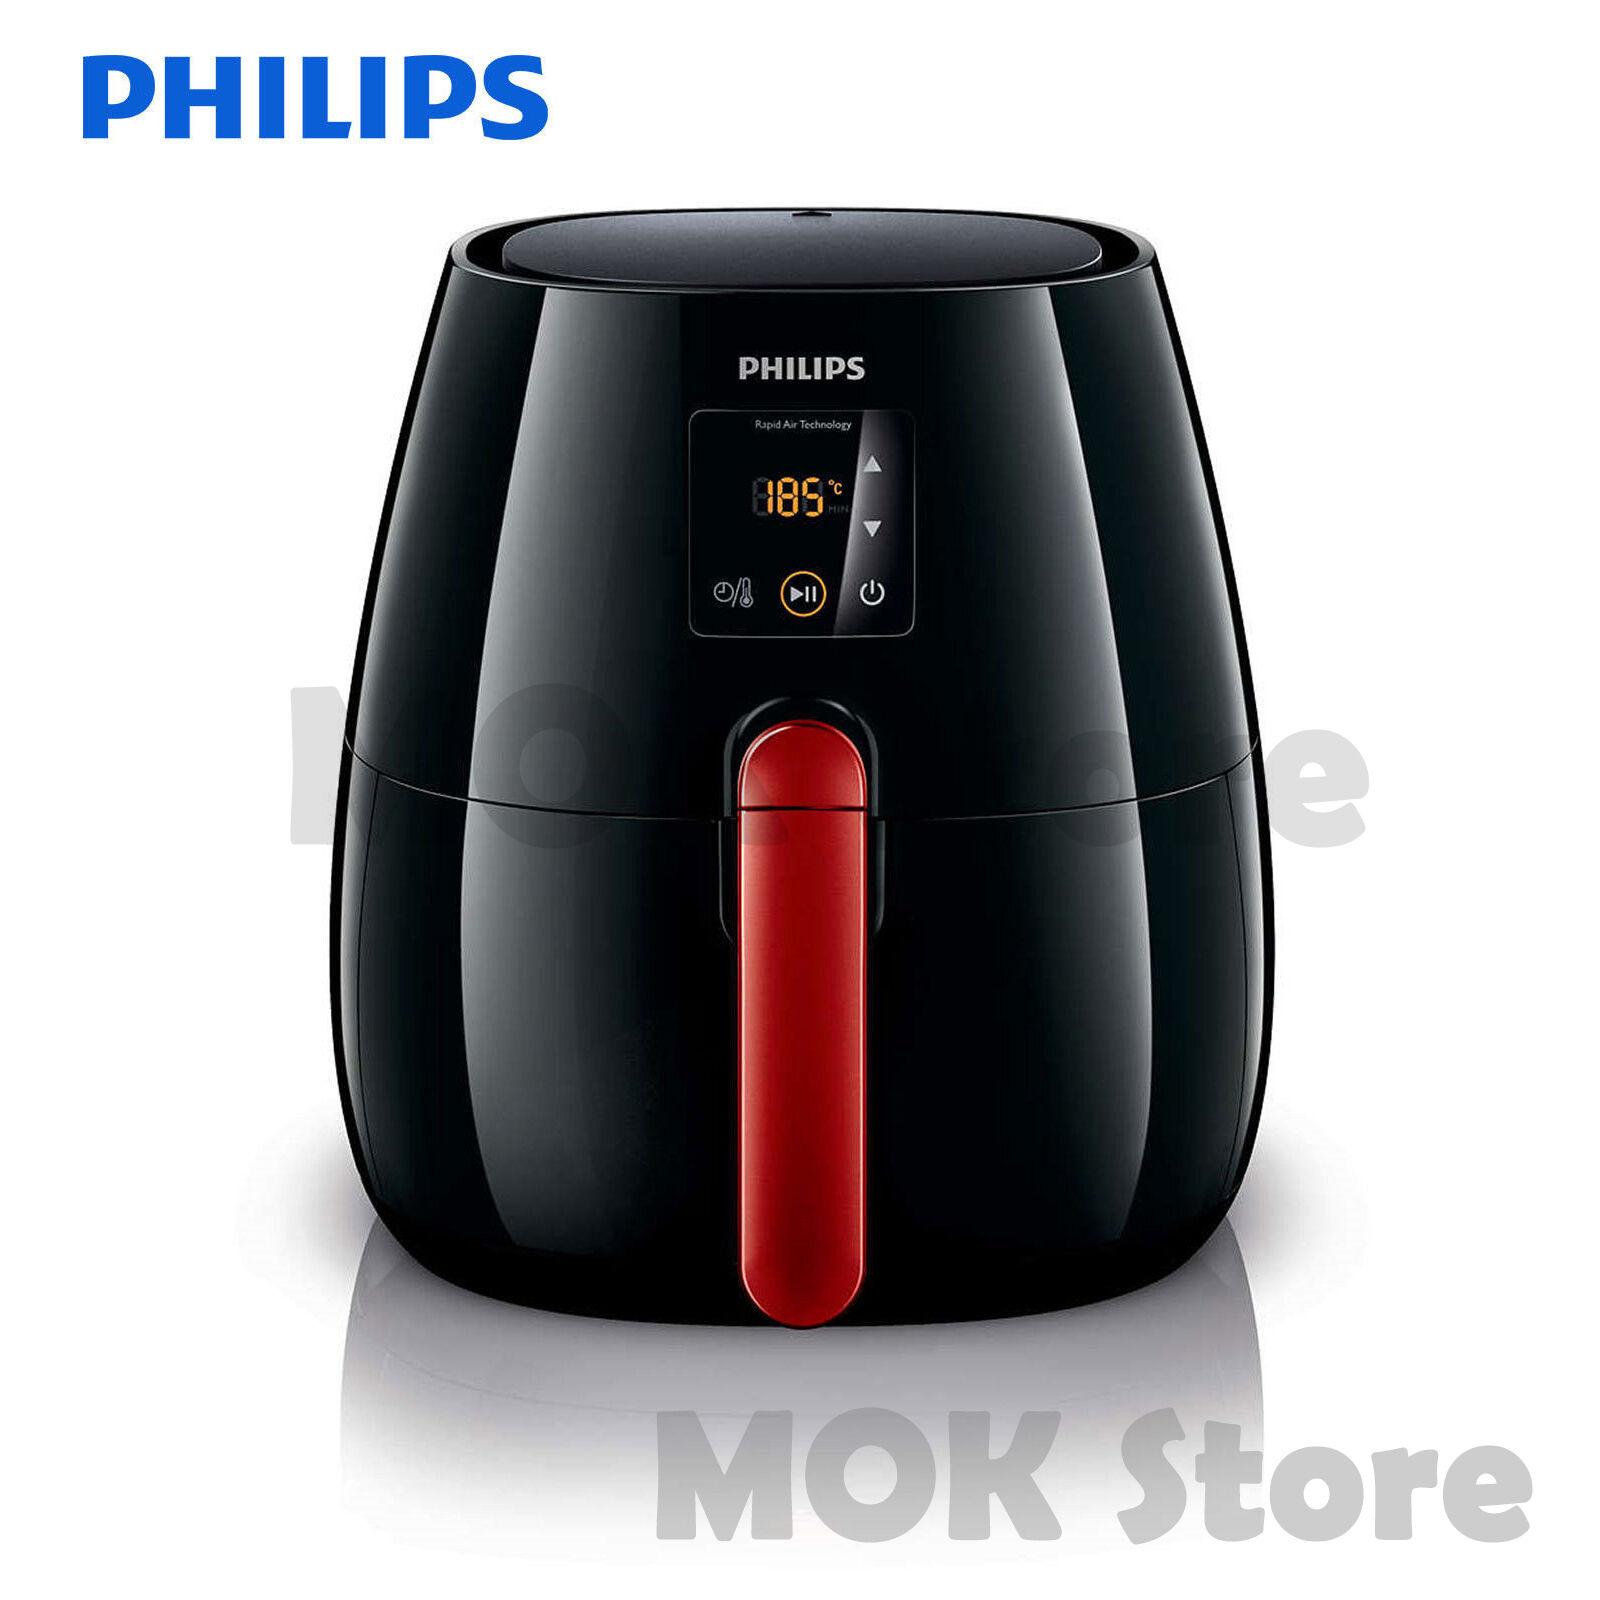 Philips HD9238 Viva Collection Digital Air Fryer Multicooker